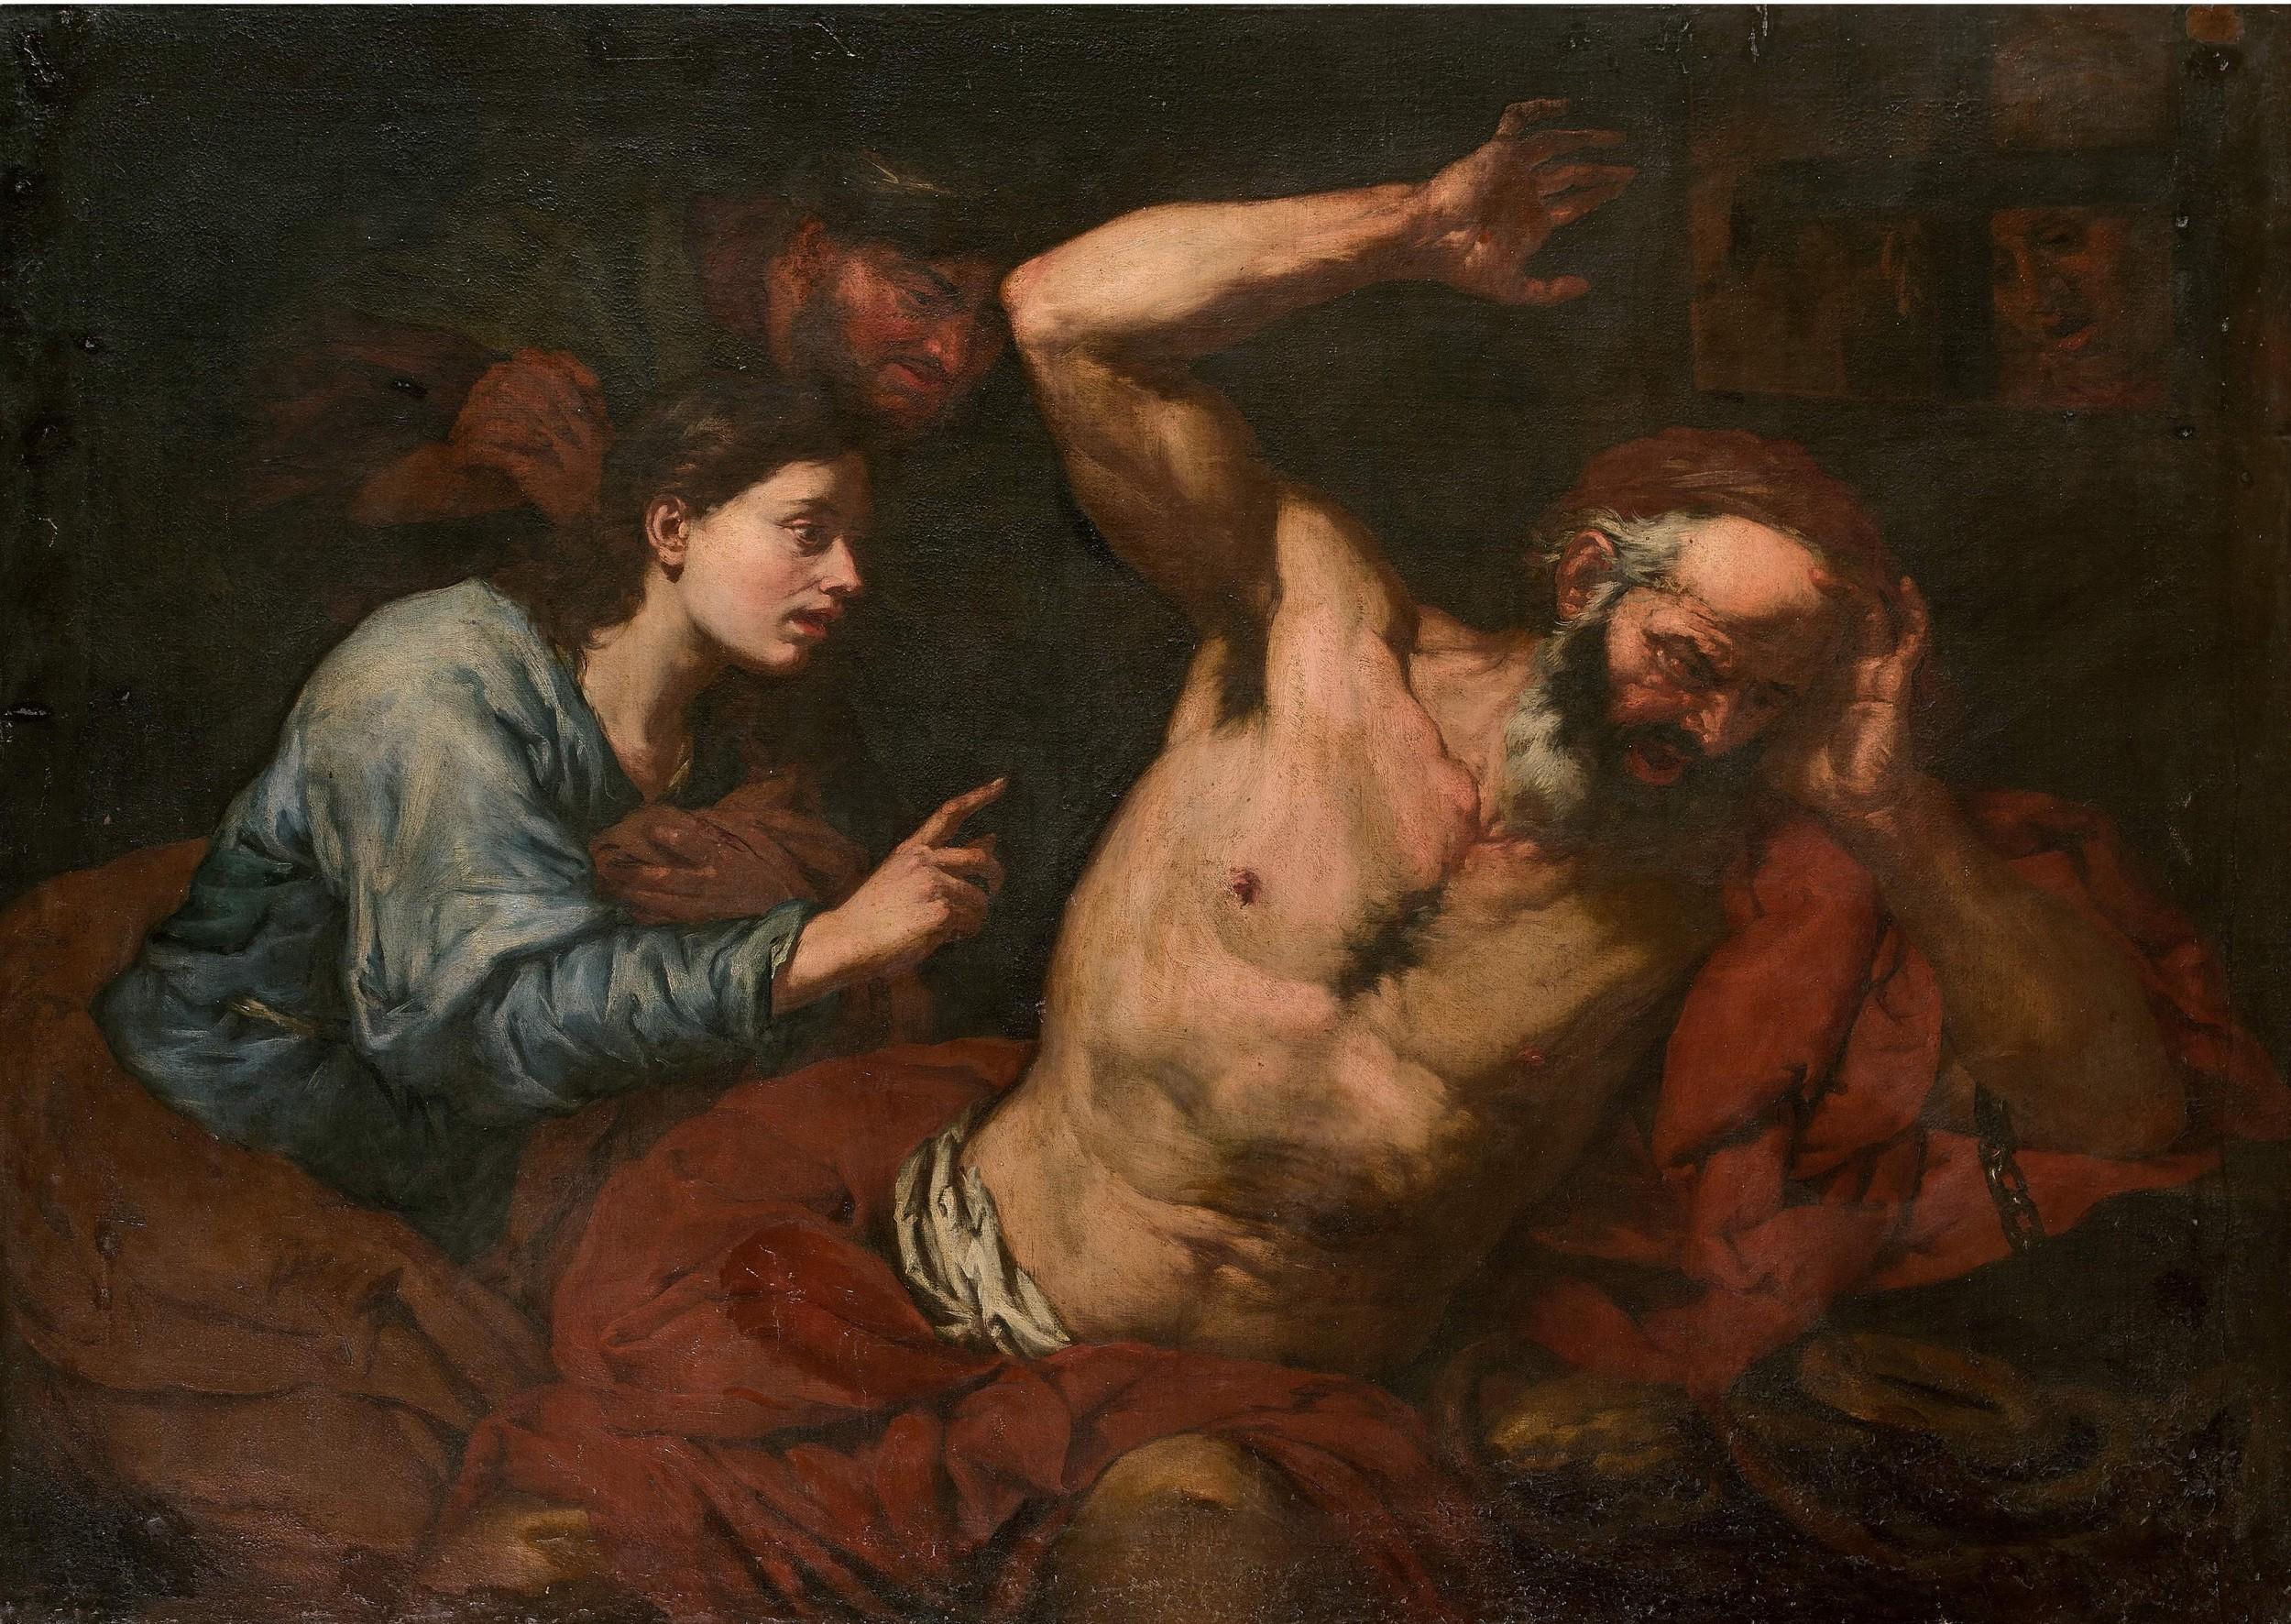 Giovanni Battista LANGETTI (Gènes 1625-Venise 1676), image ©HVMC